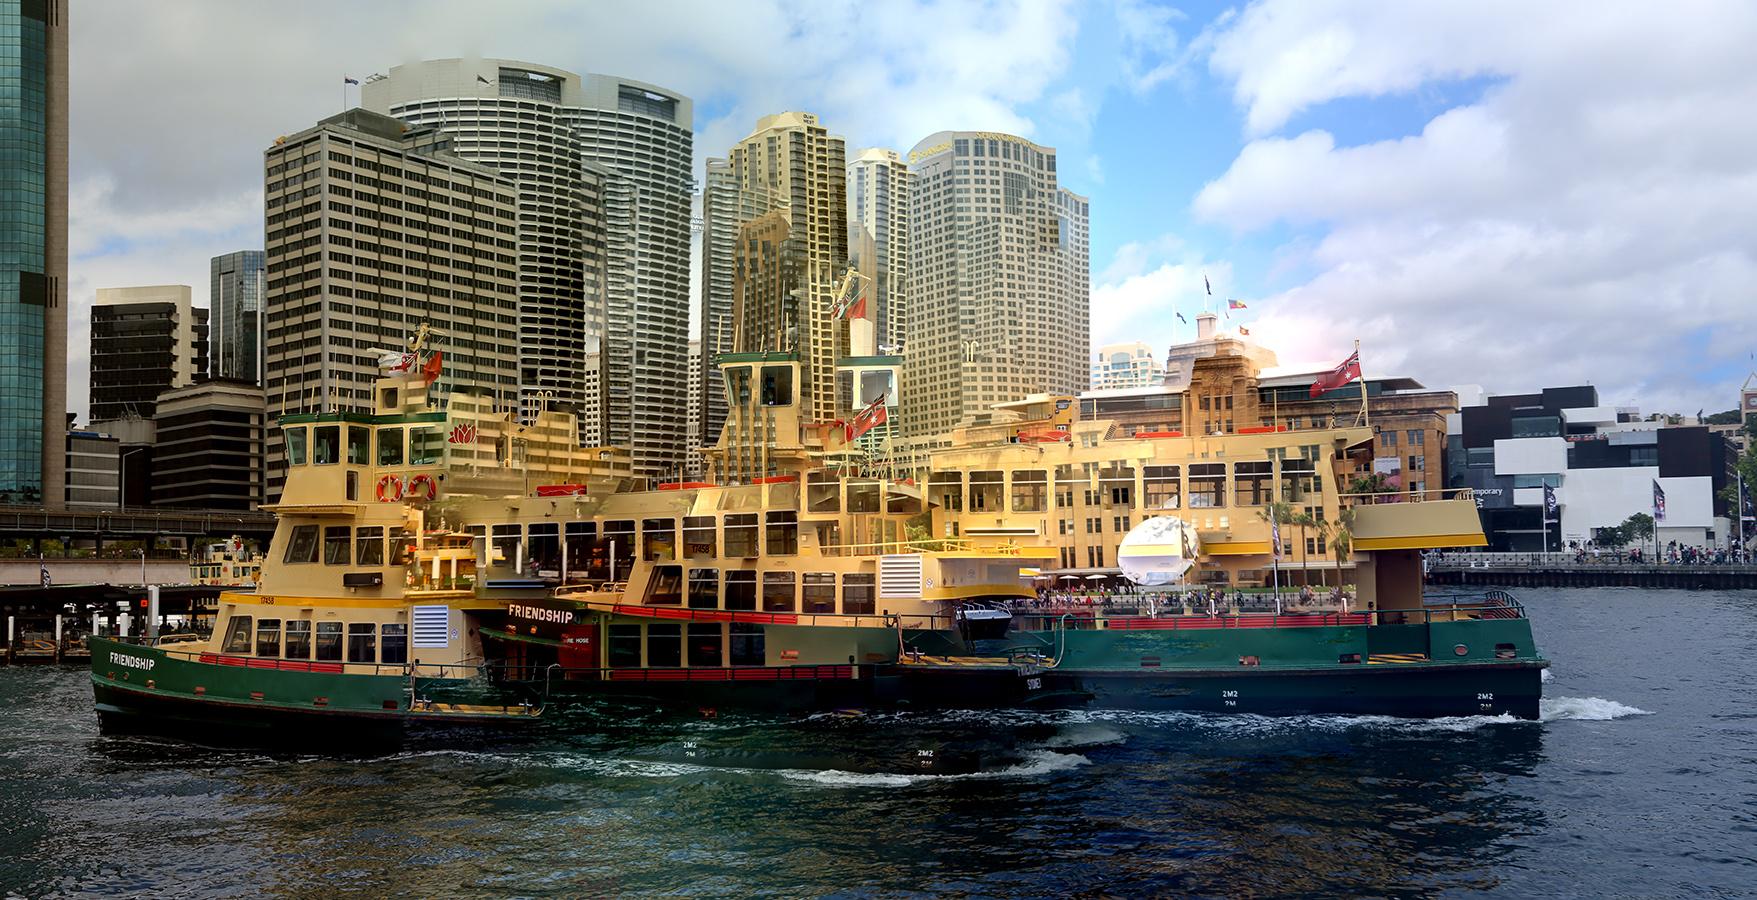 Ferry-Friendship-LRGSm.jpg